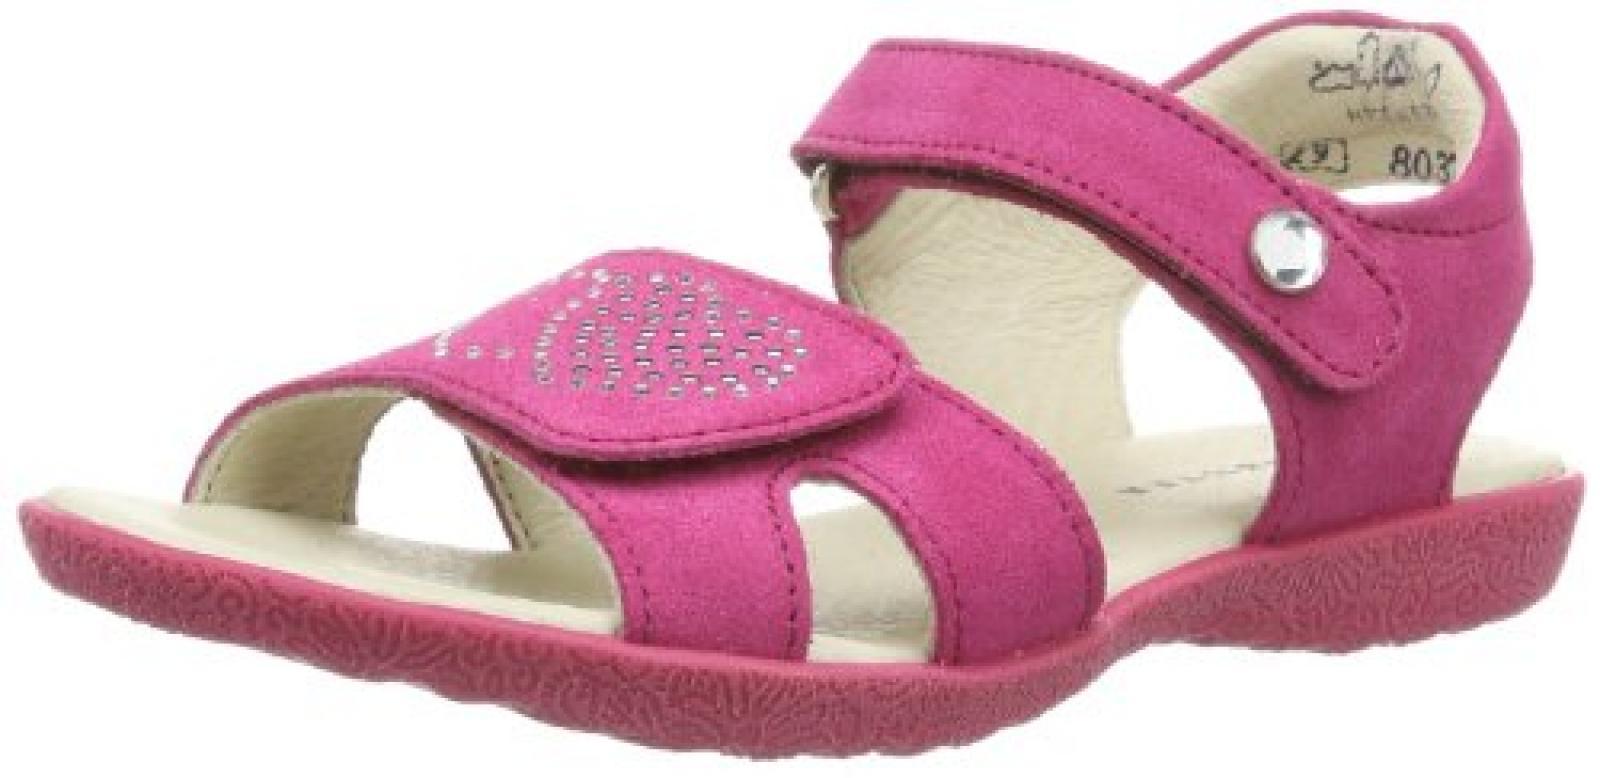 Richter Kinderschuhe Sissi 5001-321-7200 Mädchen Sandalen